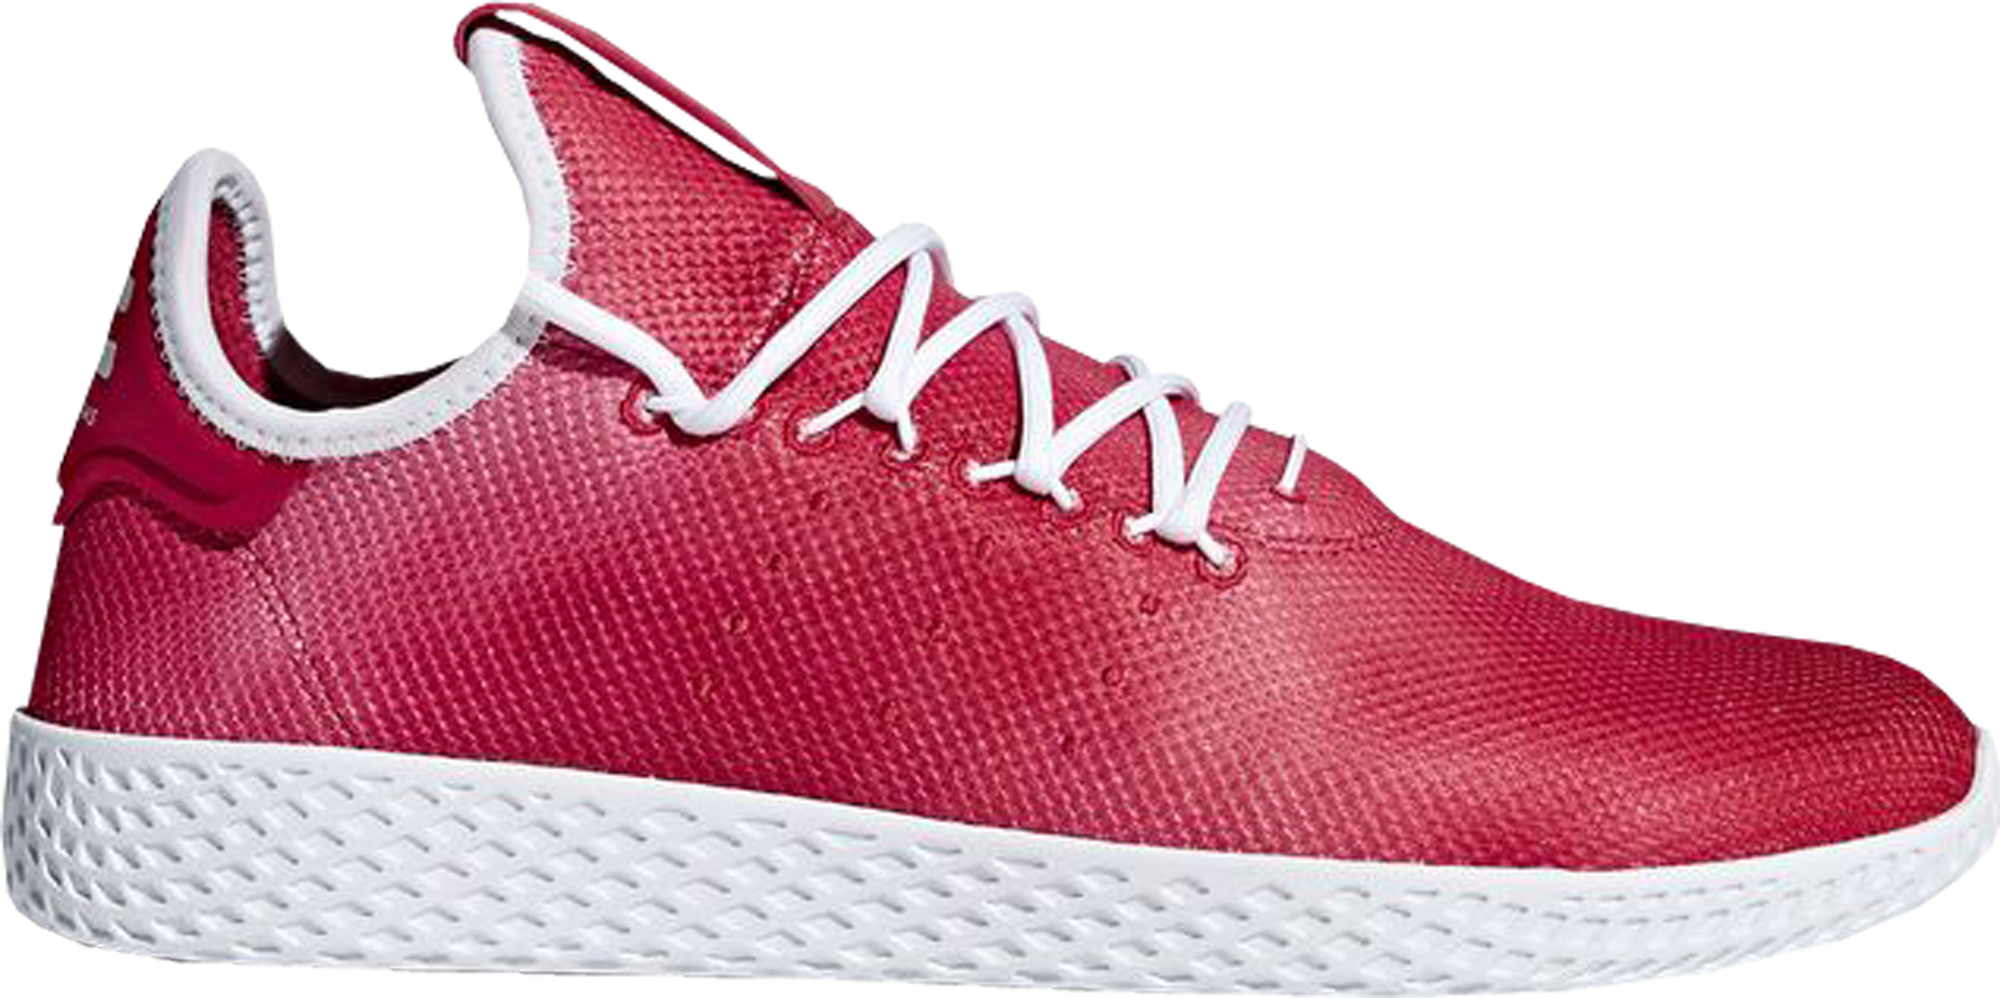 adidas Tennis HU Pharrell Holi Red